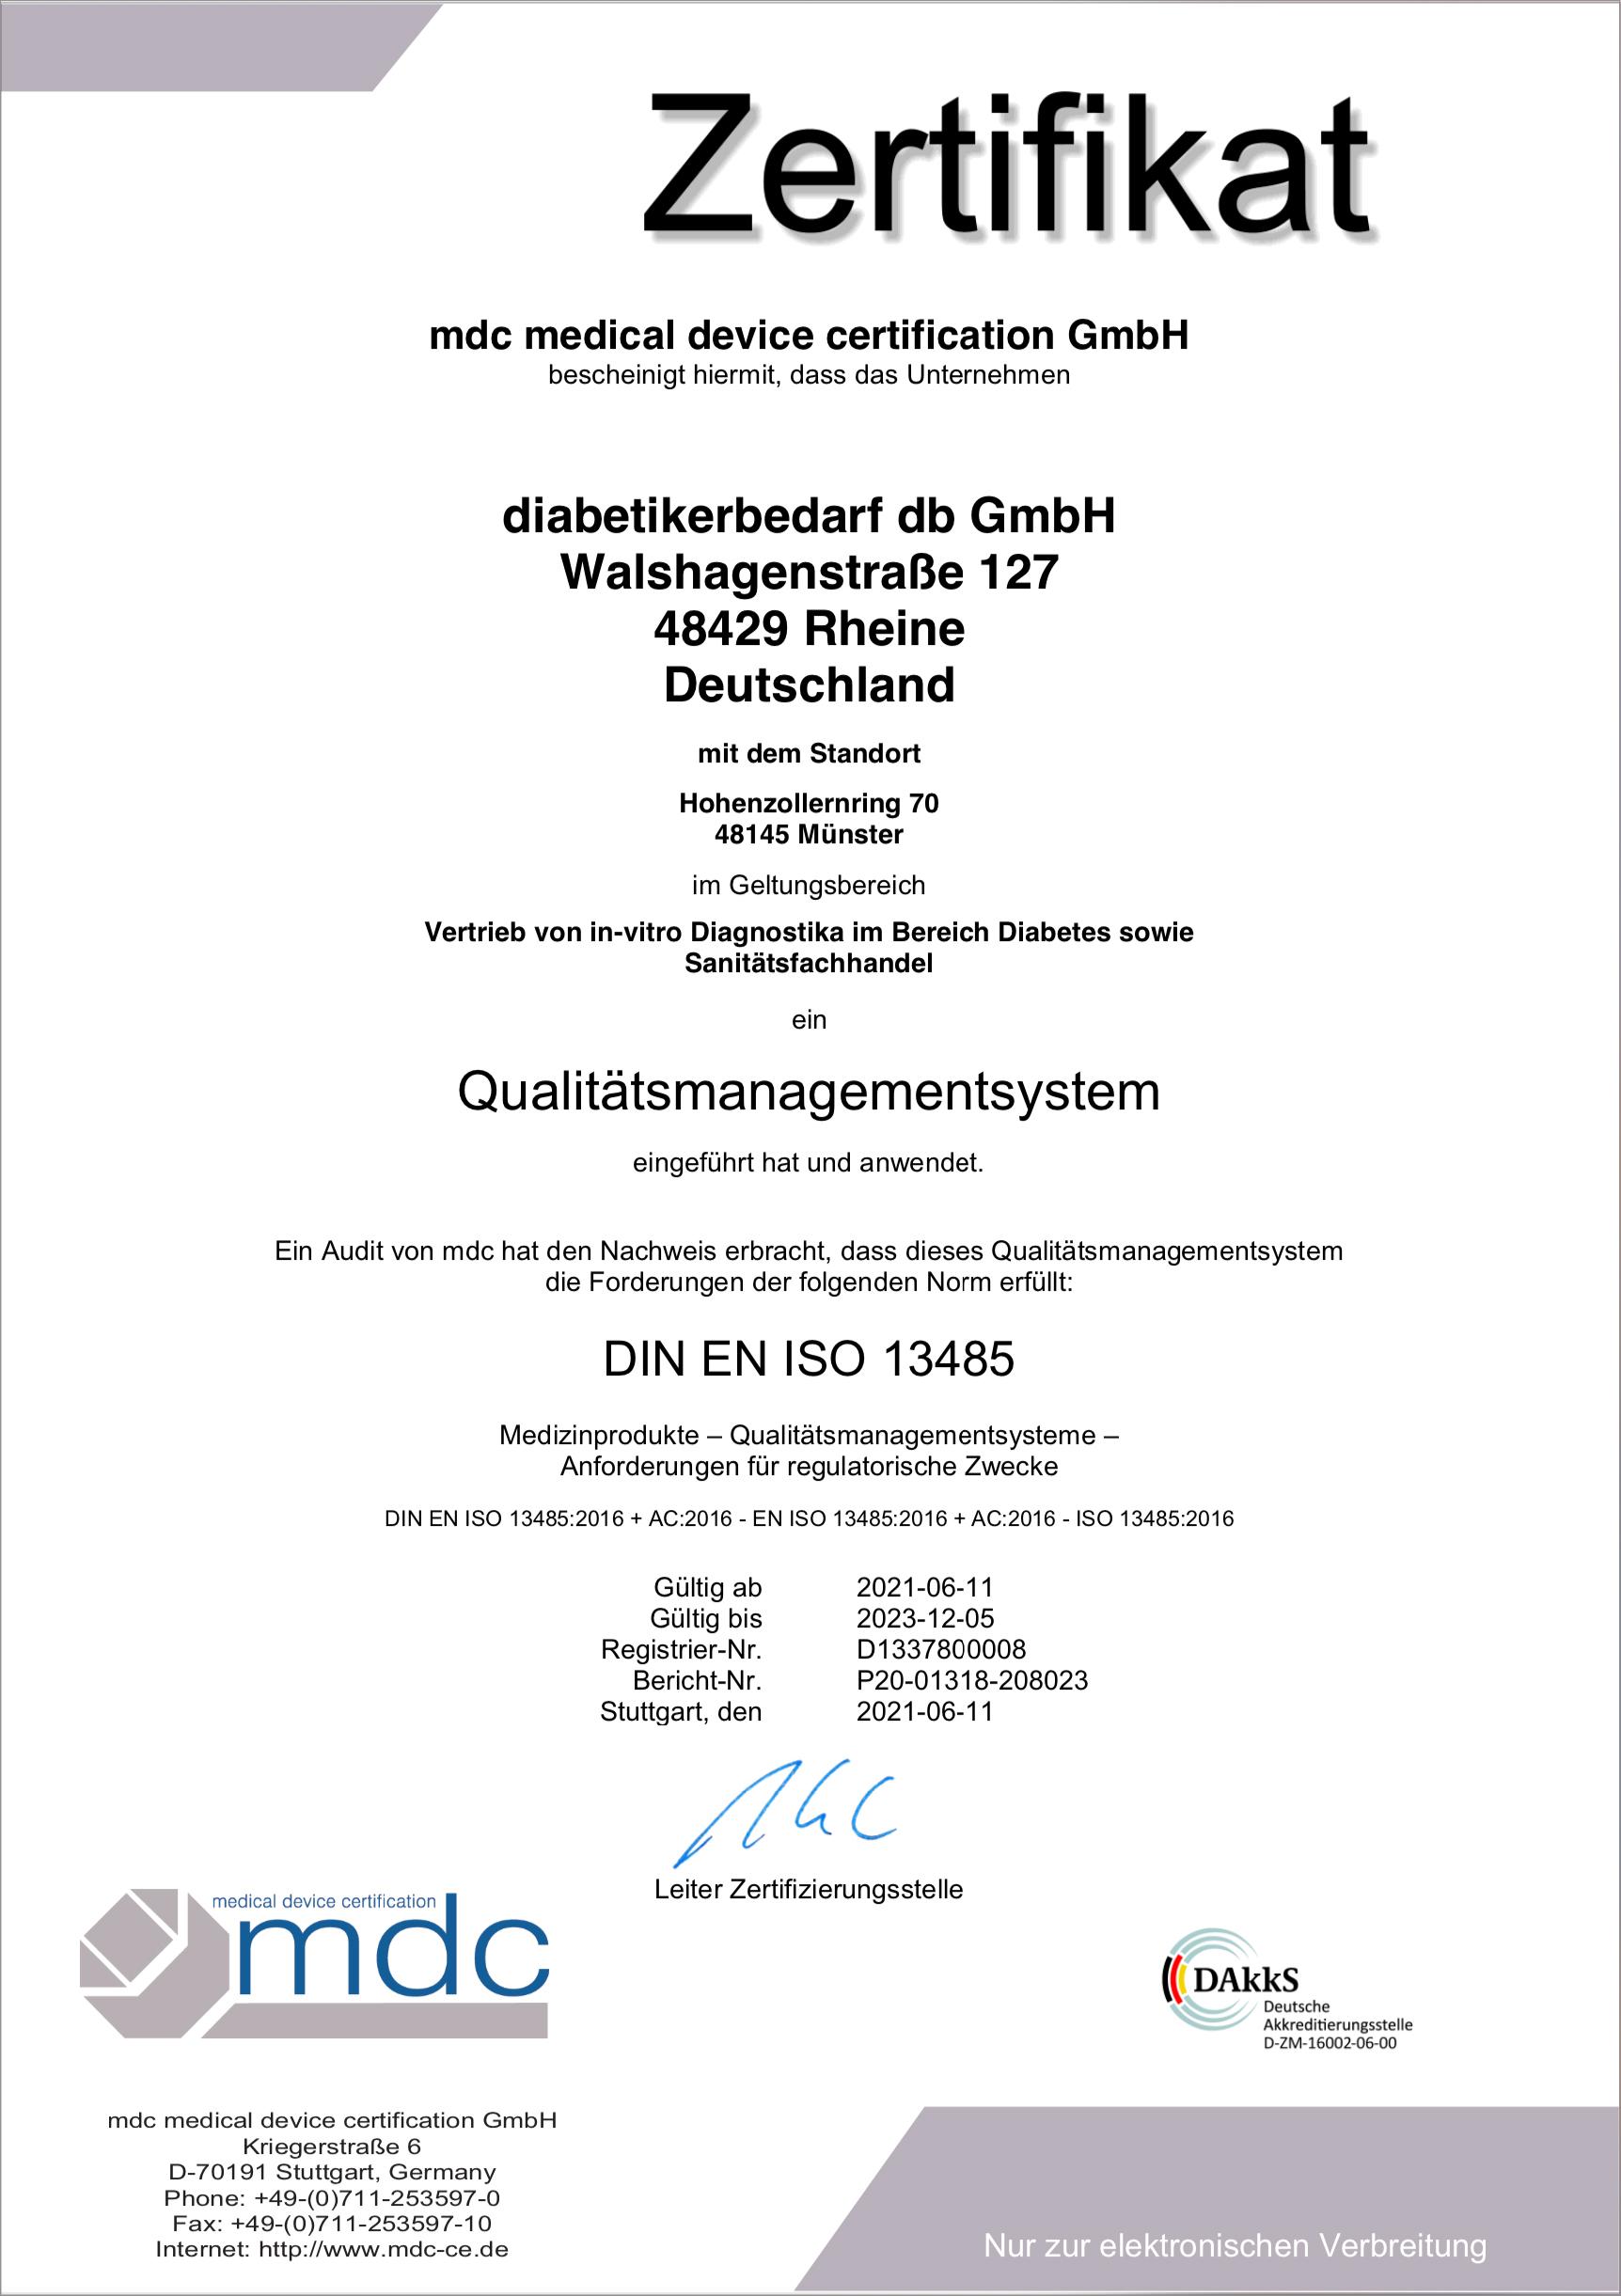 Zertifikat diabetikerbedarf